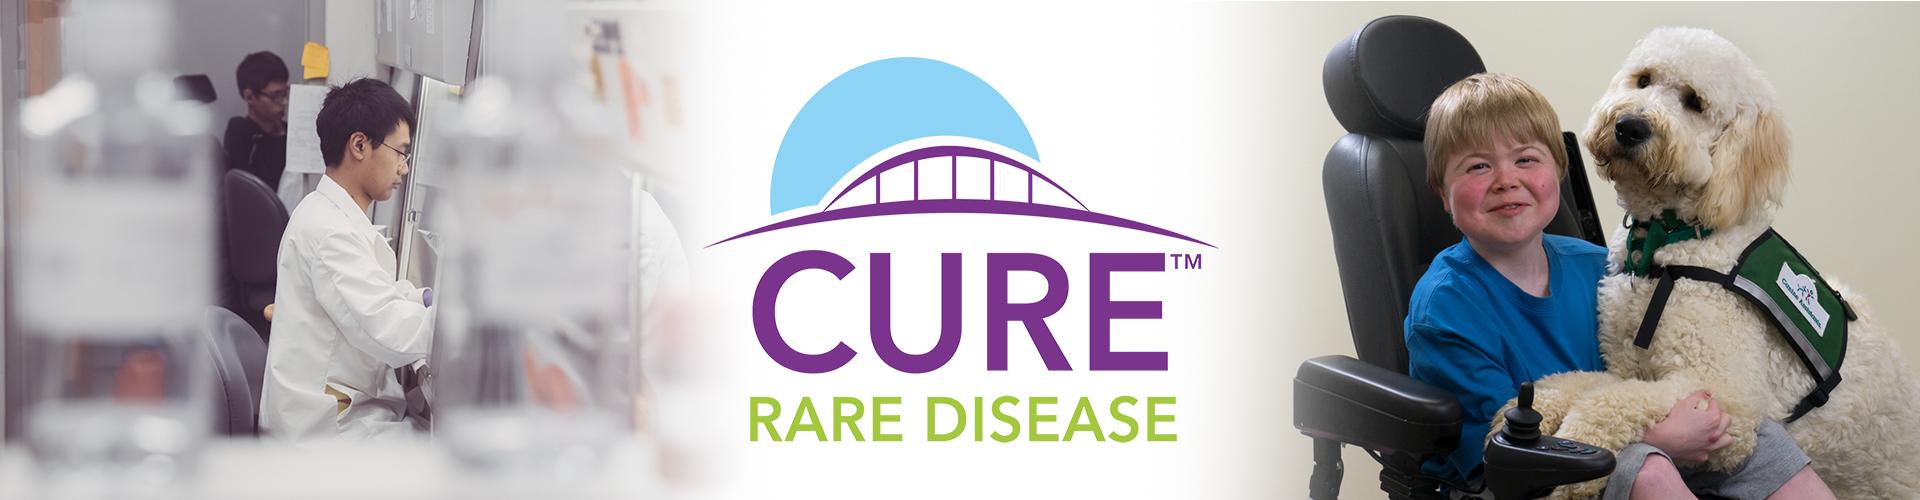 Cure Rare Disease Announces Partnership with Columbus Children's Foundation